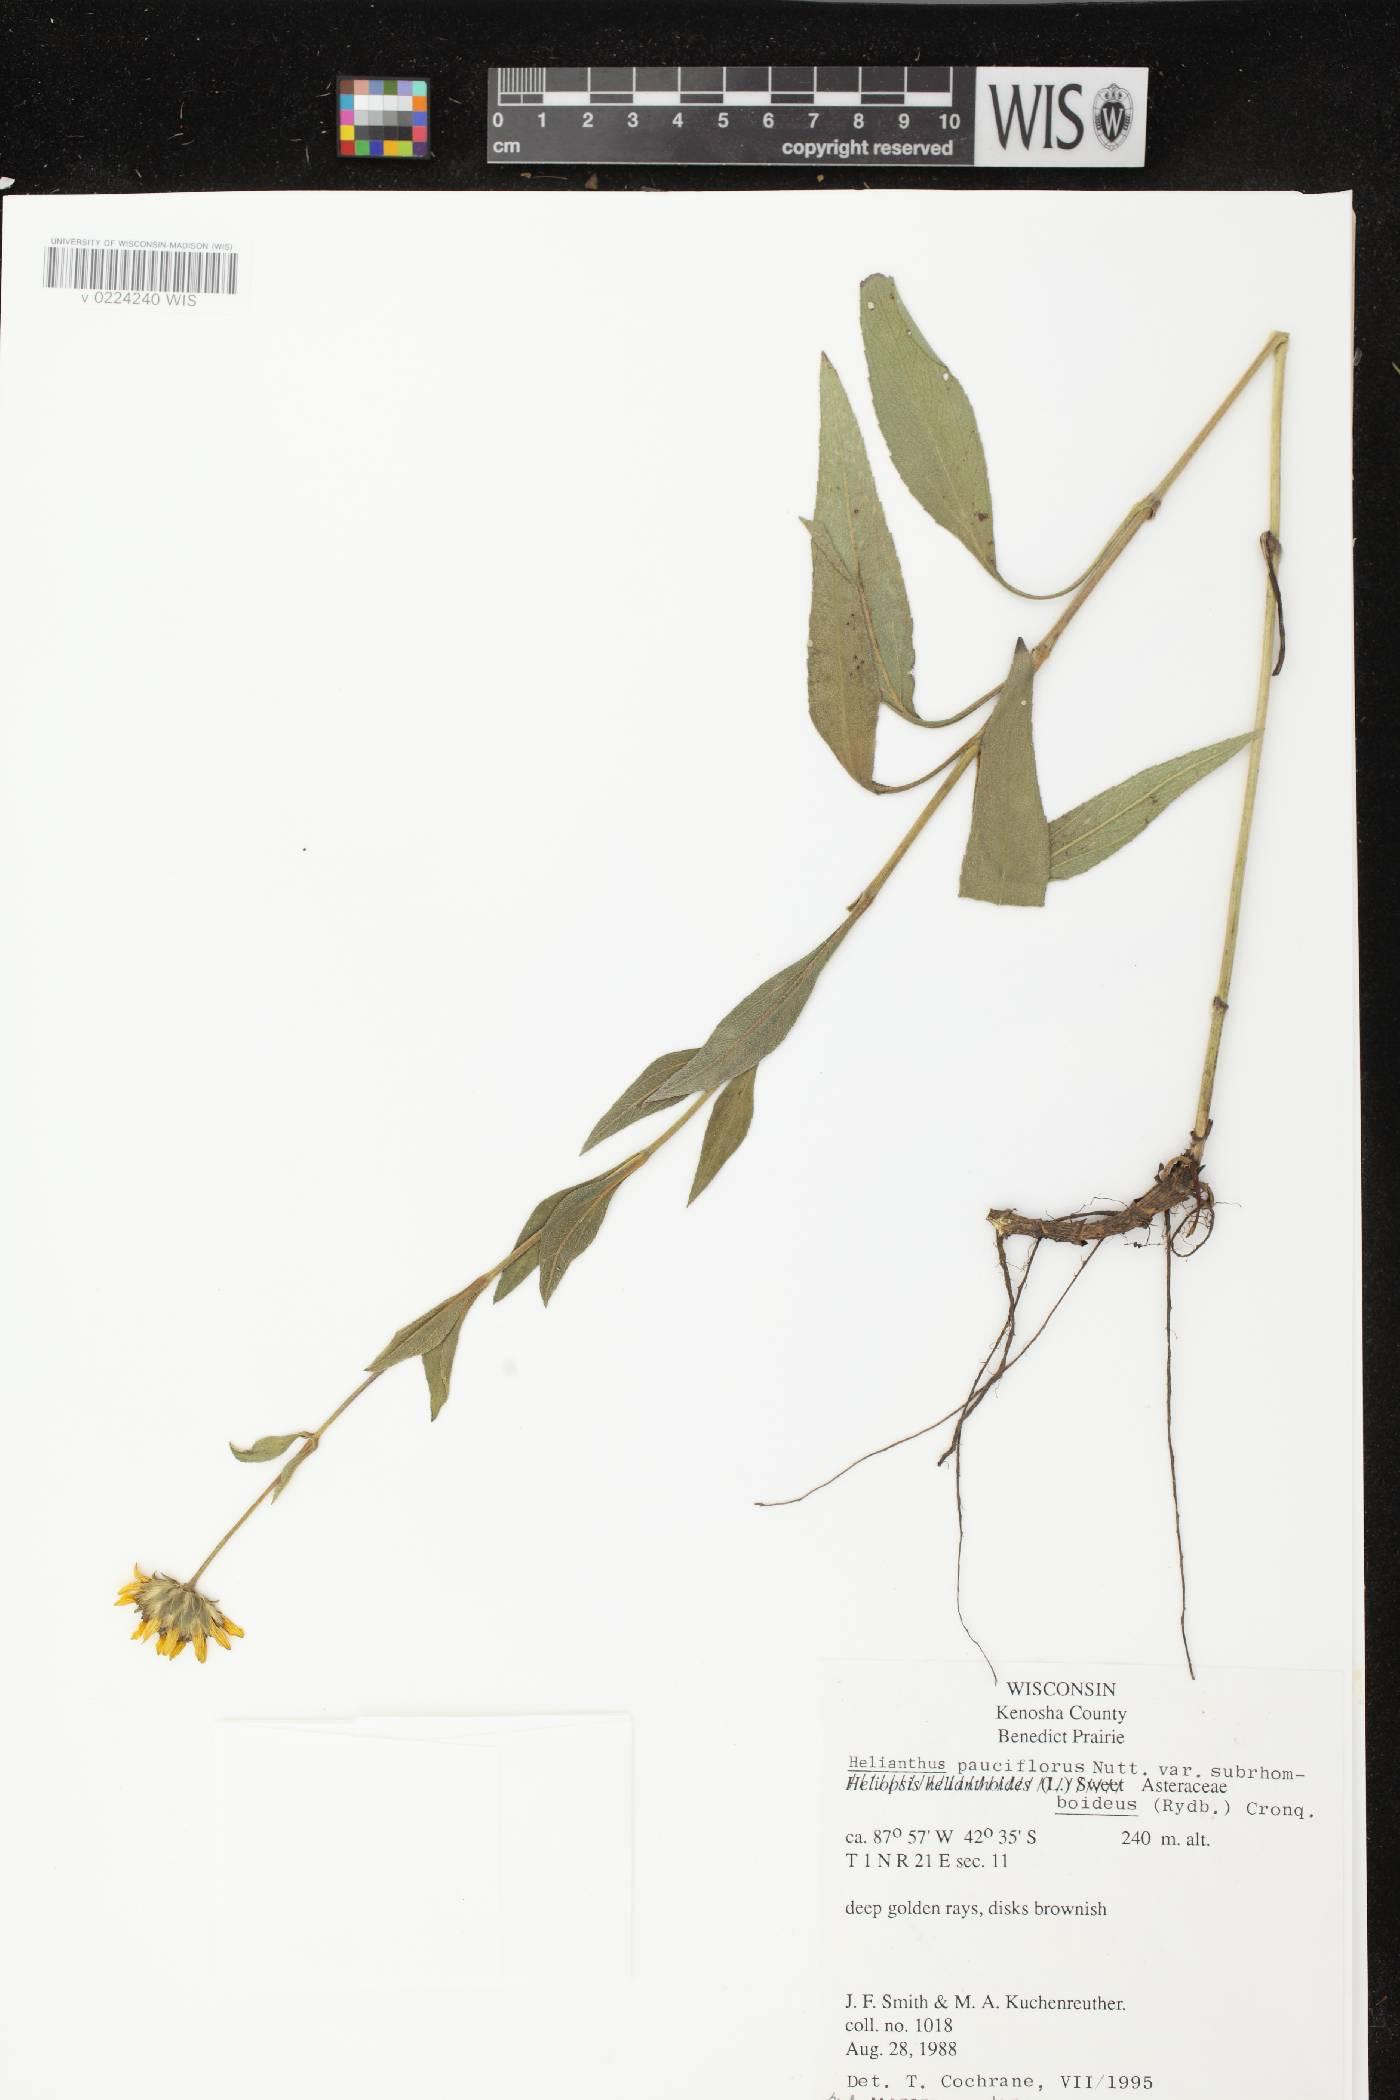 Helianthus pauciflorus subsp. subrhomboideus image